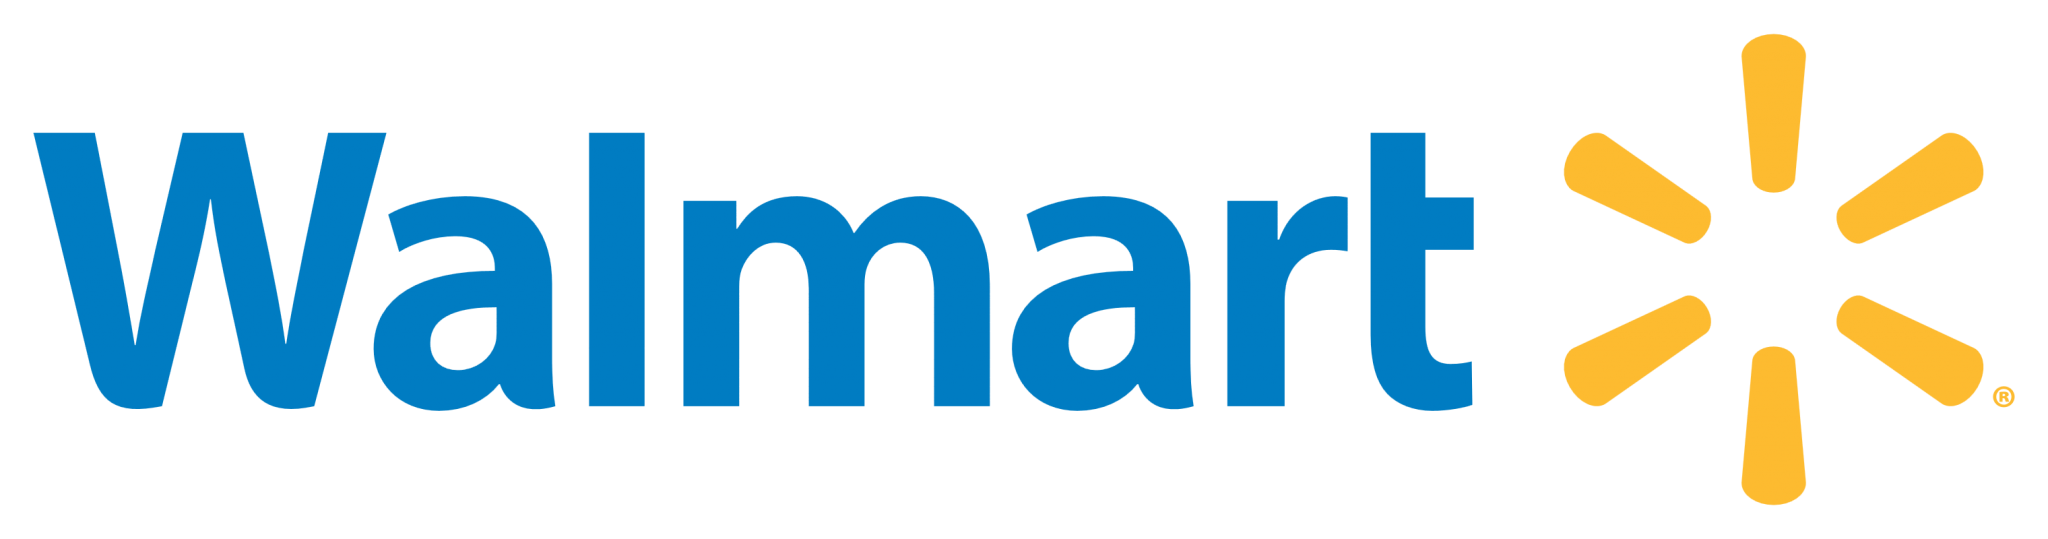 Walmart_logo_transparent_png - Kawartha-Haliburton ...